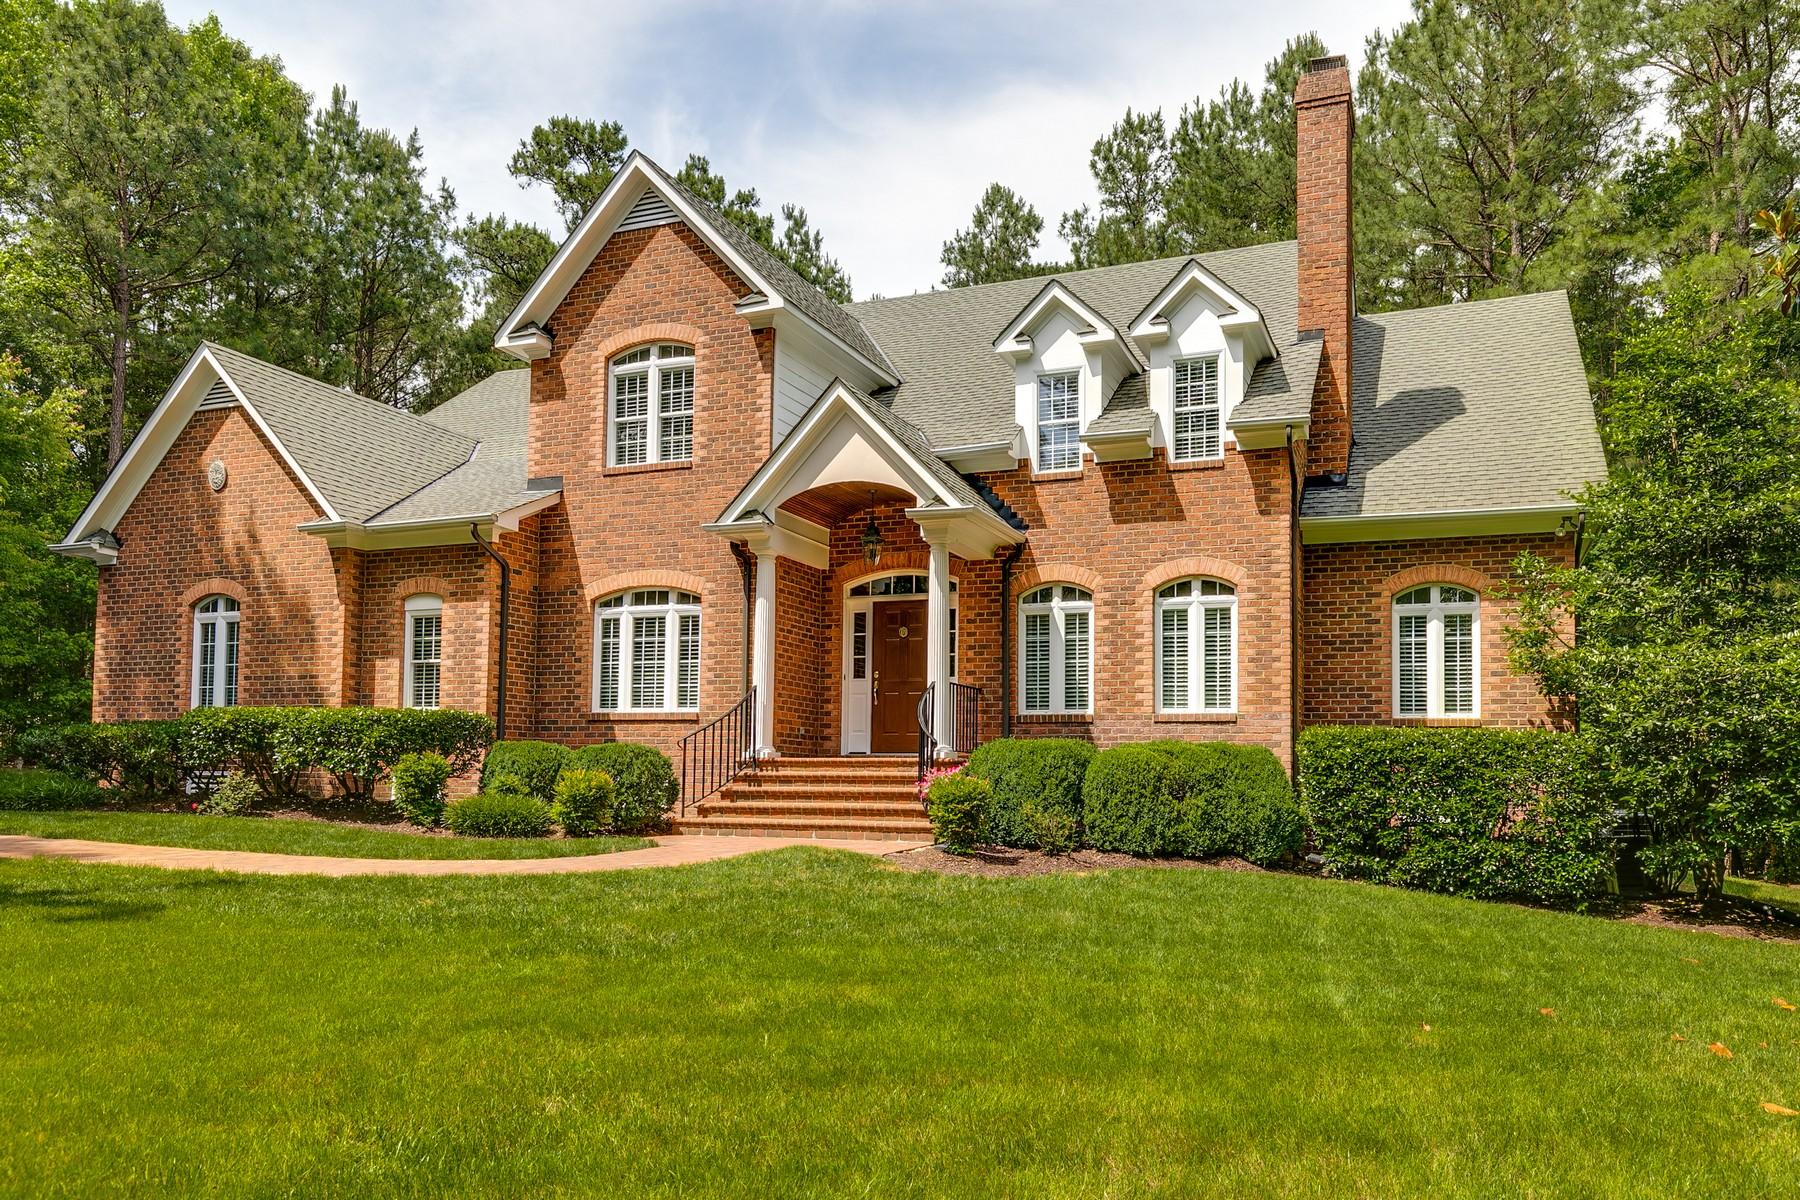 Single Family Homes for Sale at 13270 Kellington Lane Goochland, Virginia 23238 United States